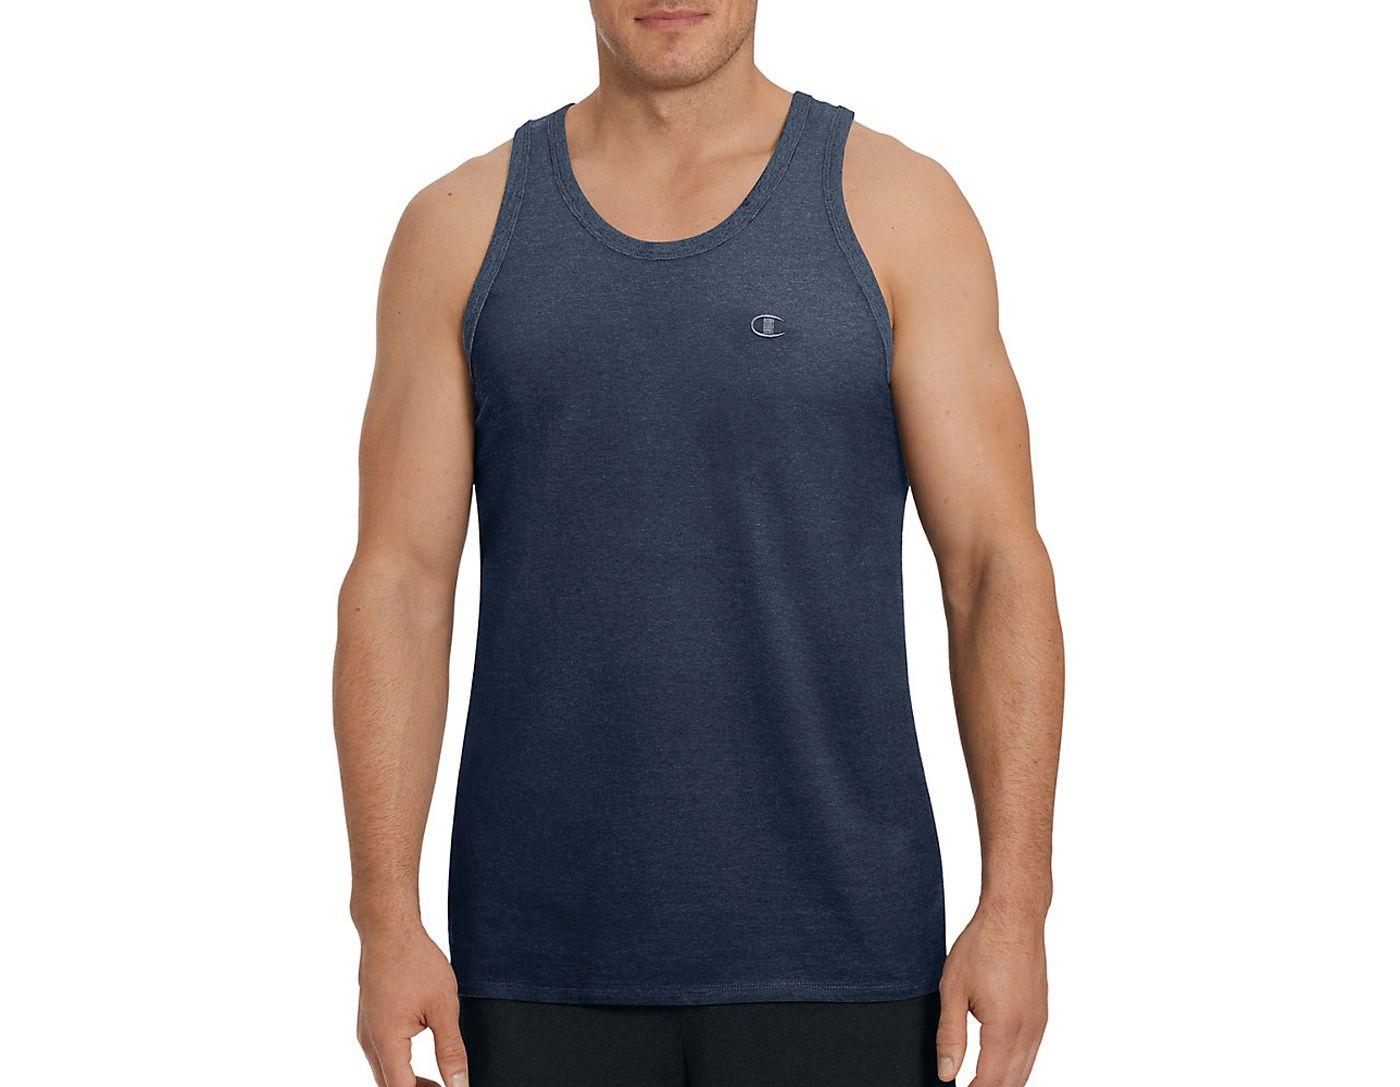 Champion Men's Classic Cotton Ringer Sleeveless Shirt